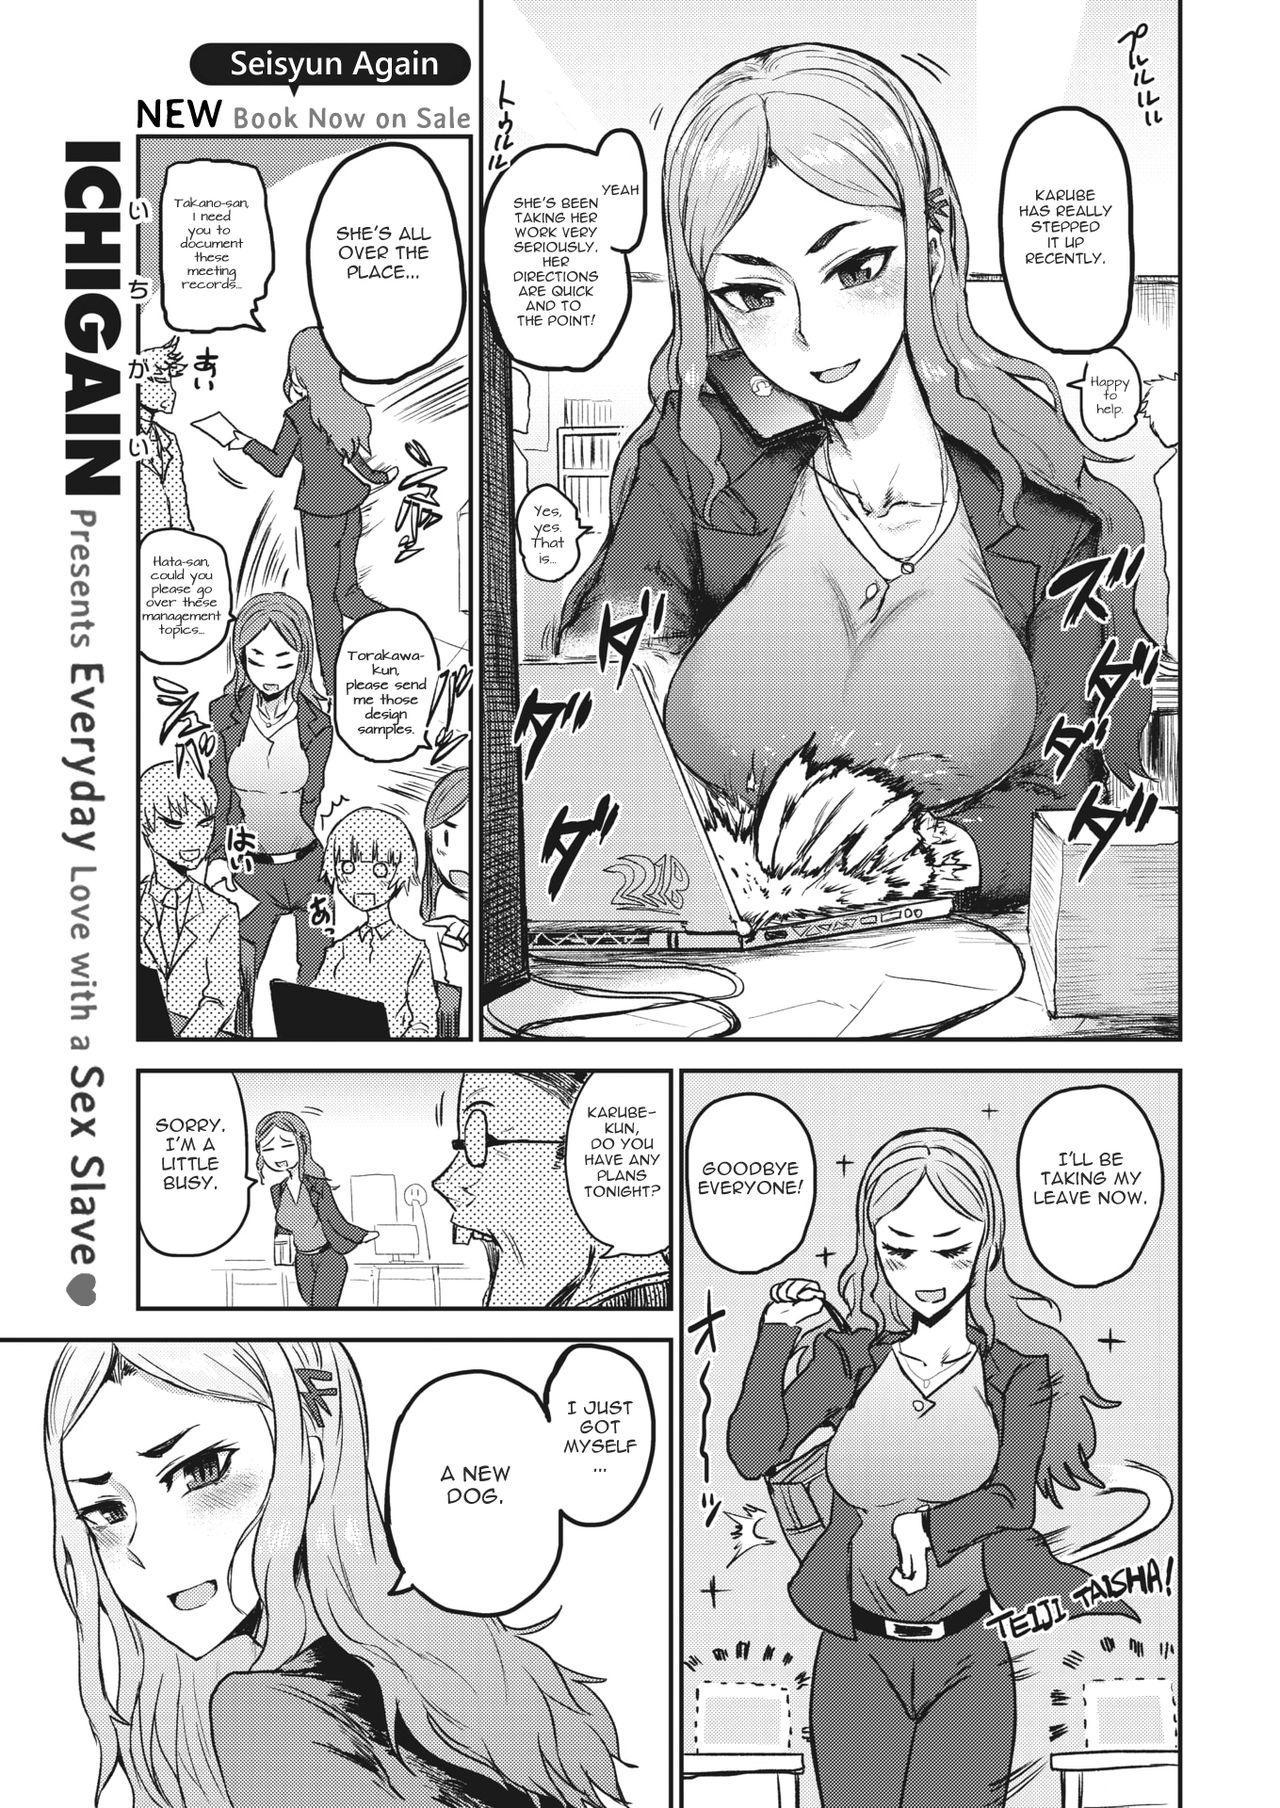 [ICHIGAIN] Tokihanatsu ~Become a Dog!~ | Let Loose ~Become a Dog~ (COMIC Kairakuten 2020-04) [English] [Moko_T] [Digital] 0